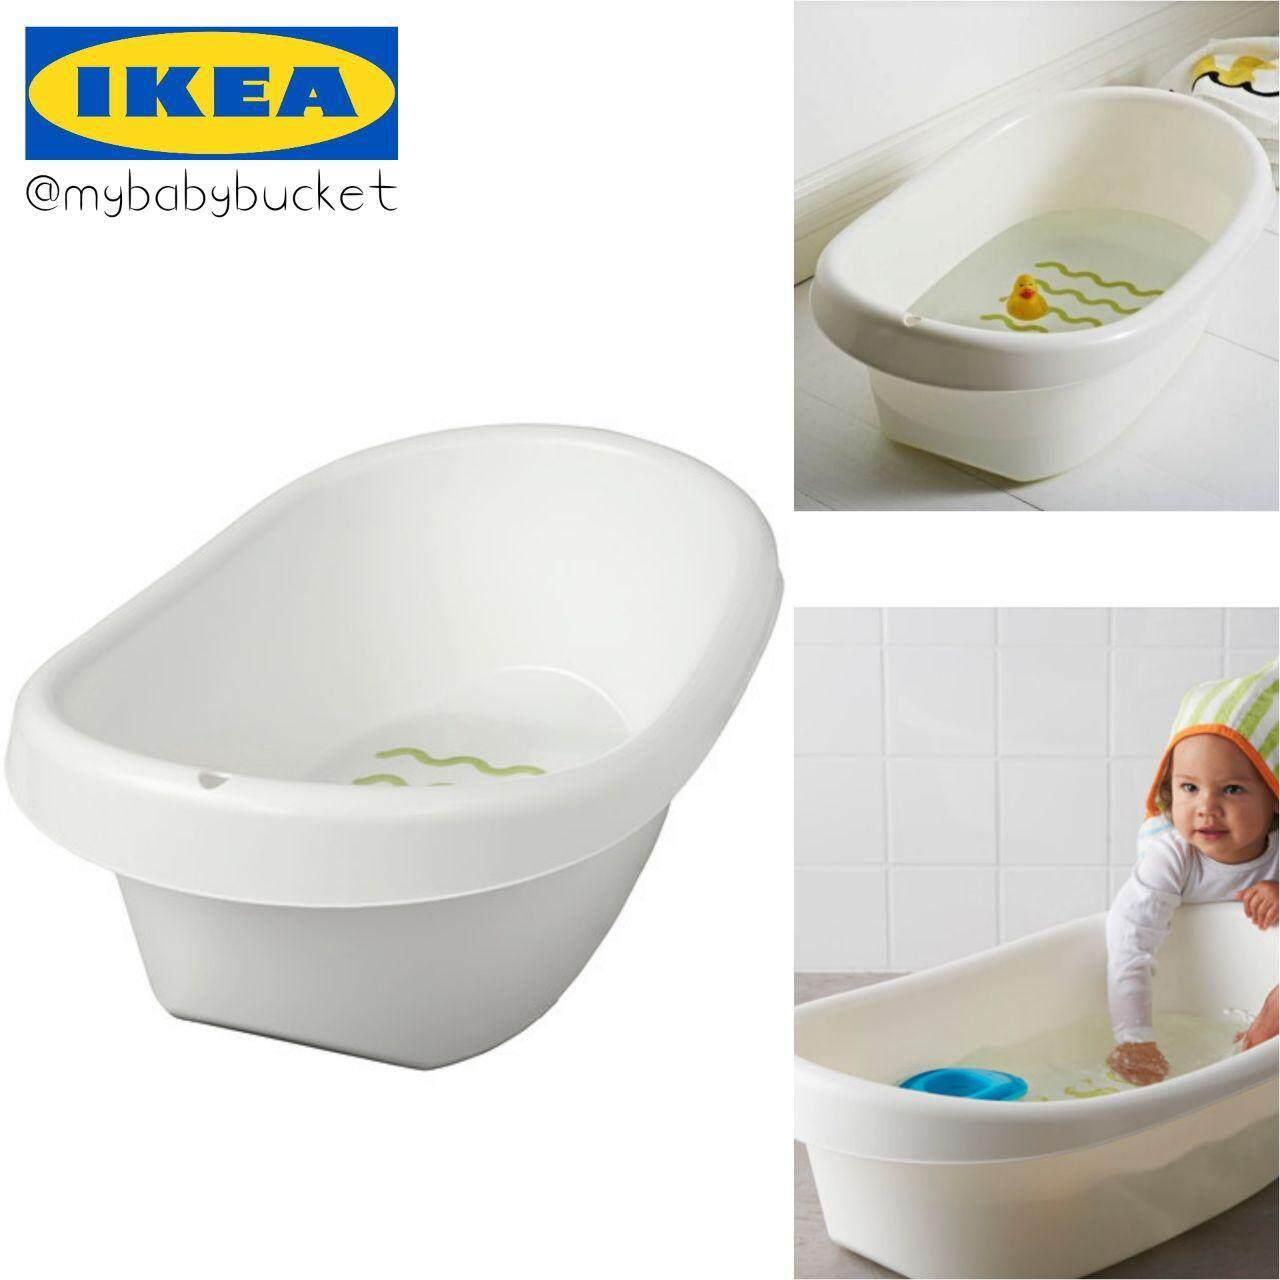 Incroyable Ikea Lattsam Baby Bath Tub